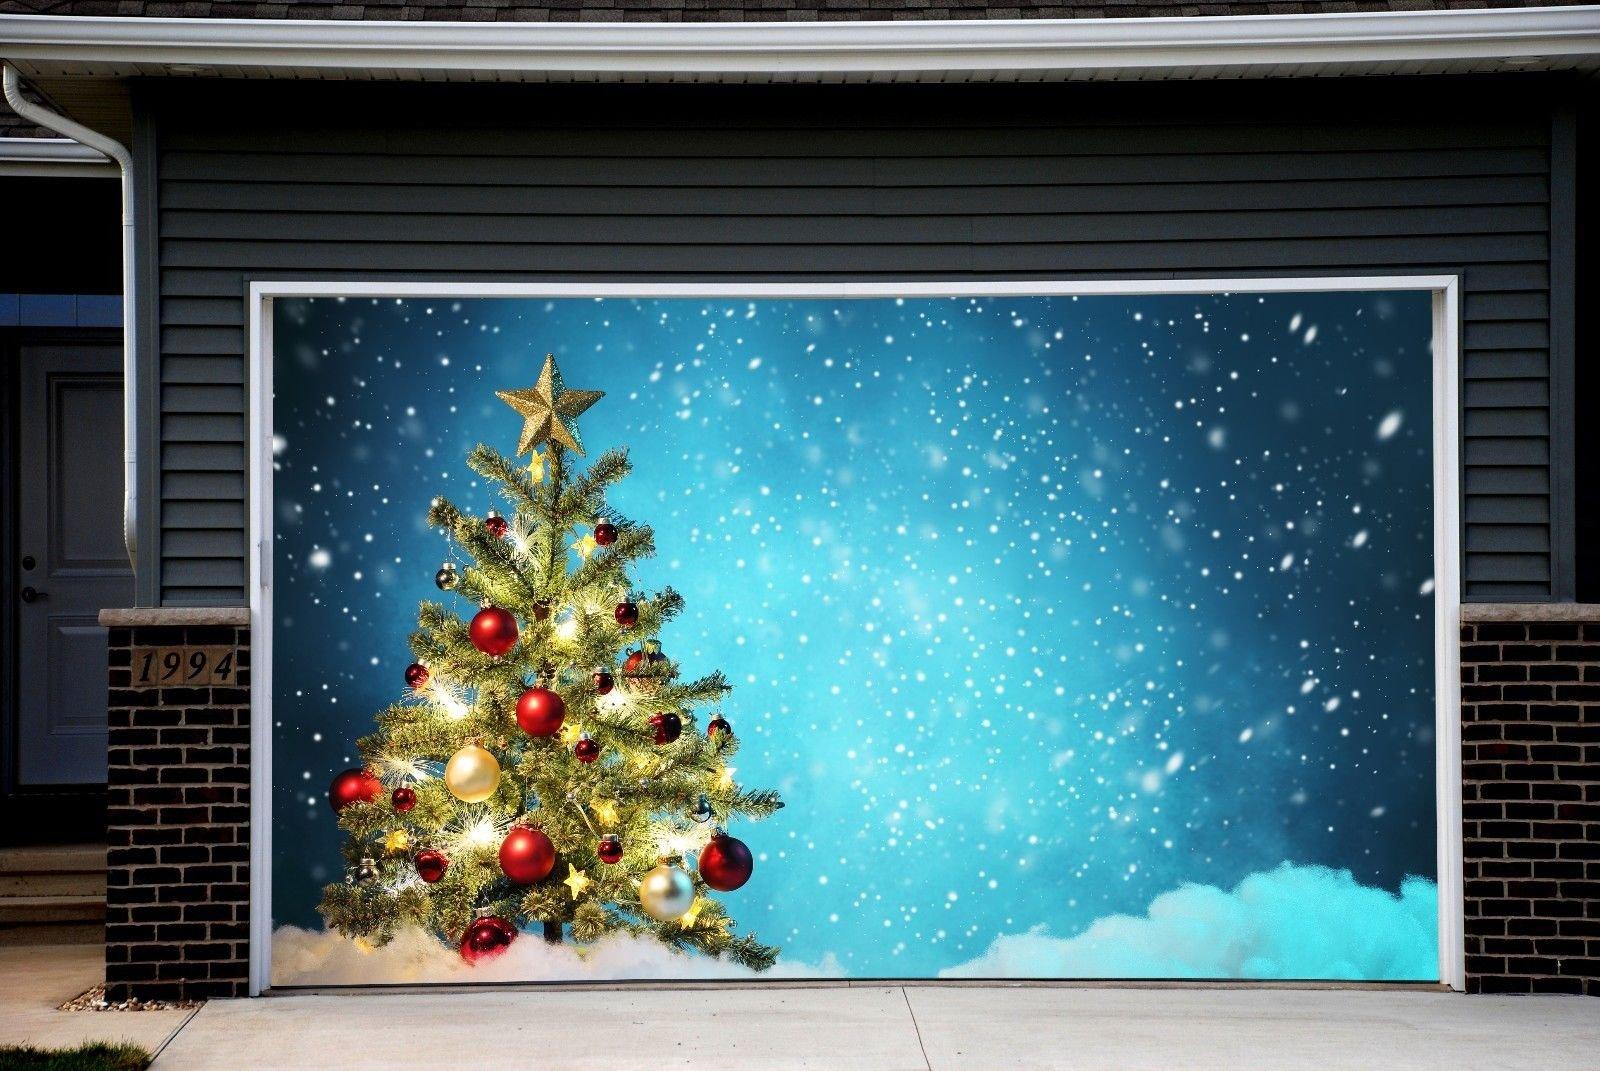 Christmas Tree Garage Door Covers Banners Outdoor Full Color House Billboard for 2 Car Garage Door Holiday REUSABLE CHRISTMAS DECOR 3D Effect Art Murals size 82x188 inches DAV47